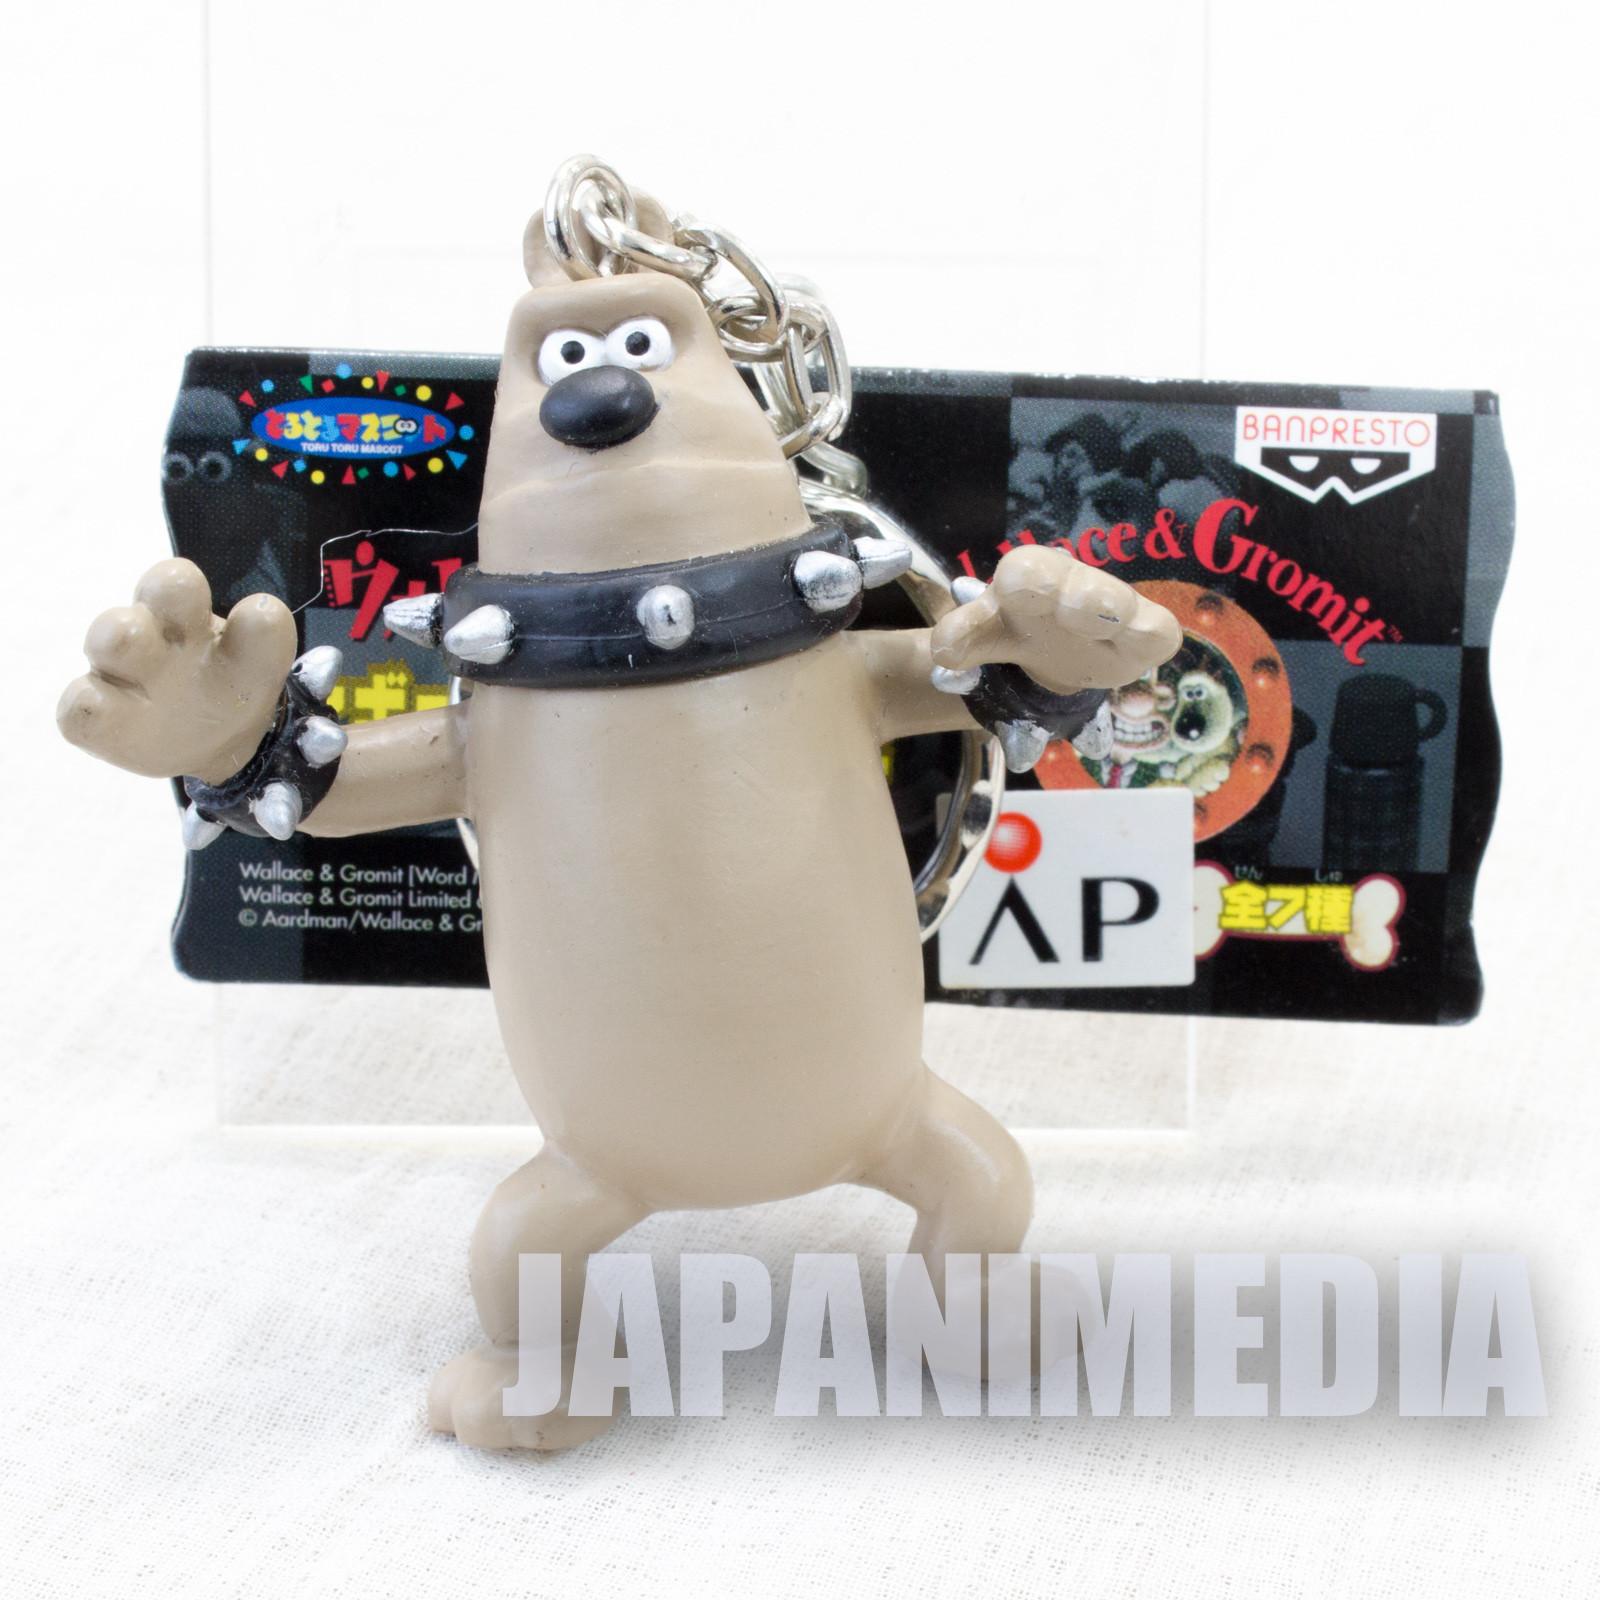 Wallace & Gromit Preston Figure Key Chain 2 Banpresto JAPAN Ardman ANIME